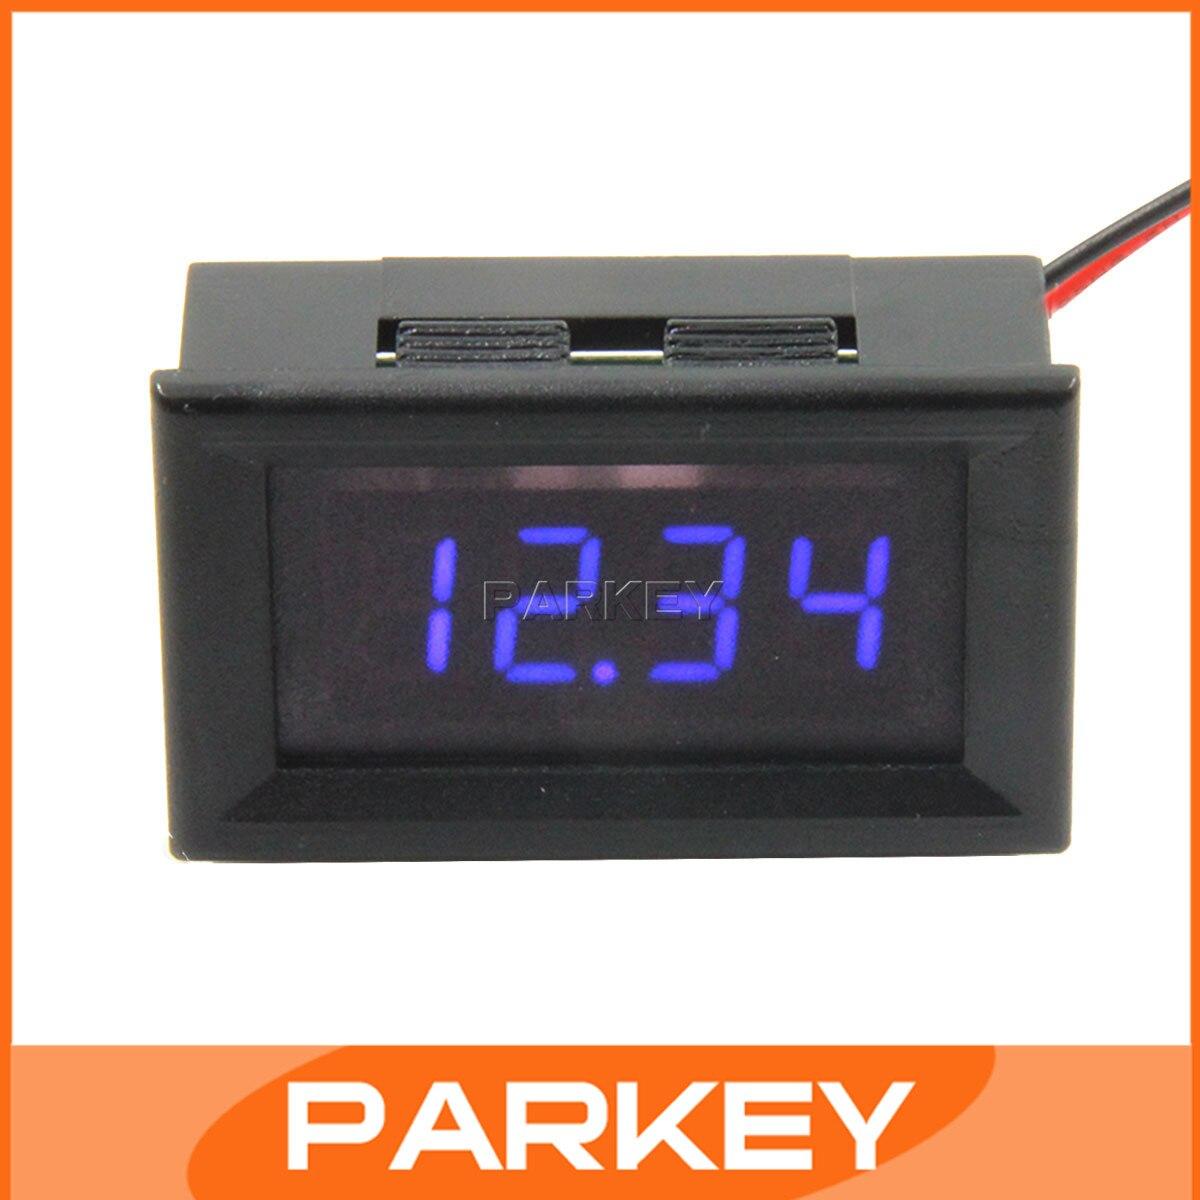 Led Voltmeter Kits : Popular diy led voltmeter buy cheap lots